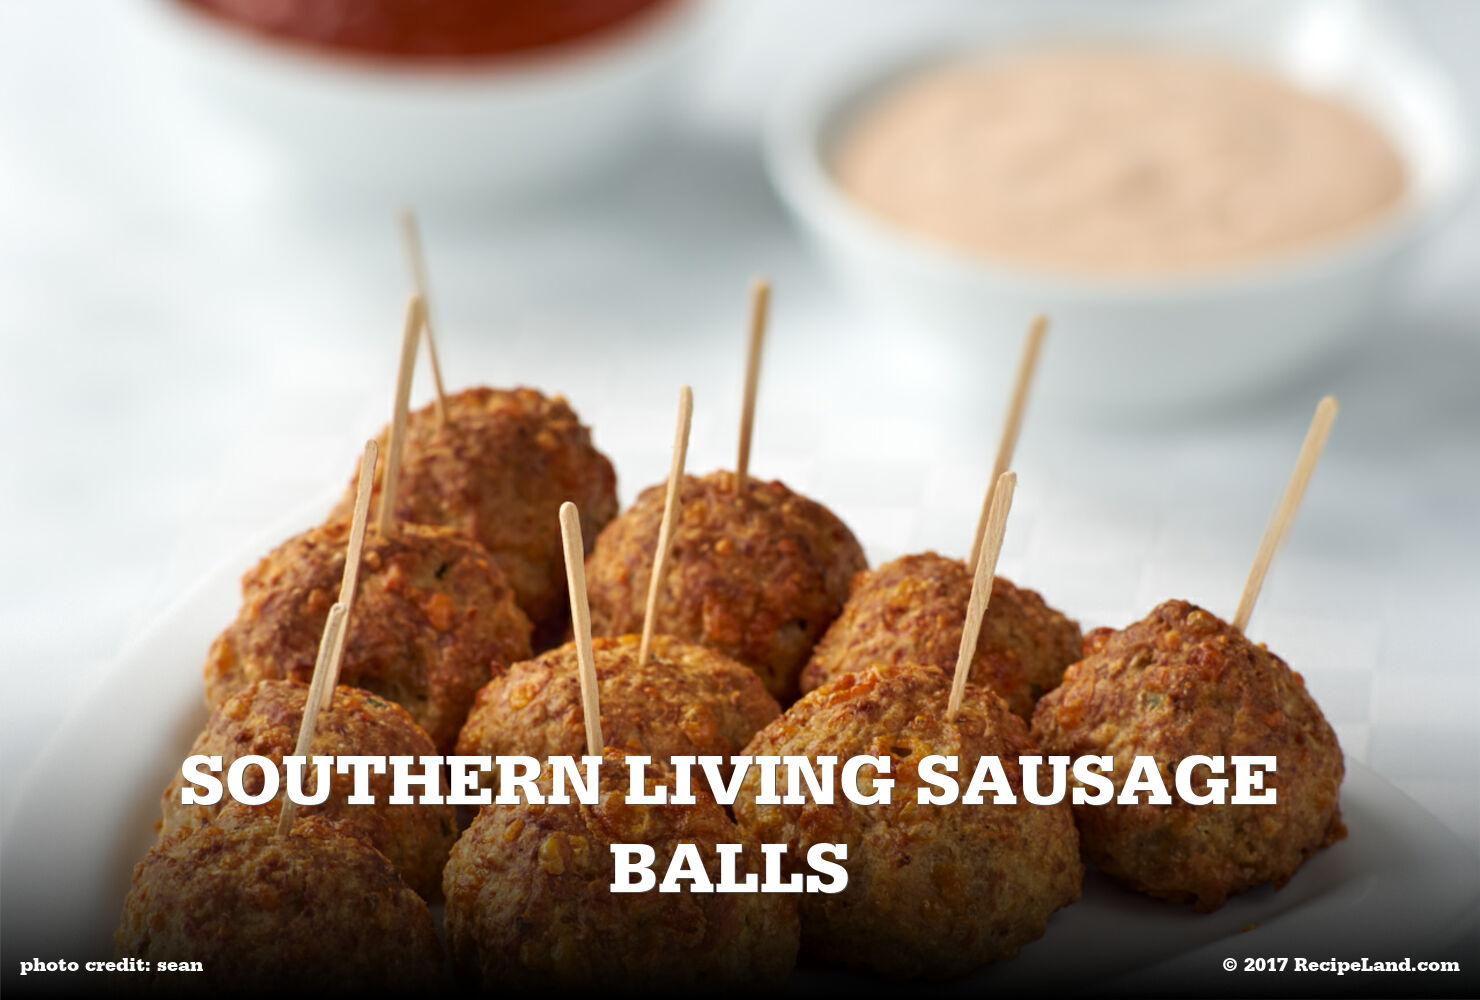 Southern Living Sausage Balls